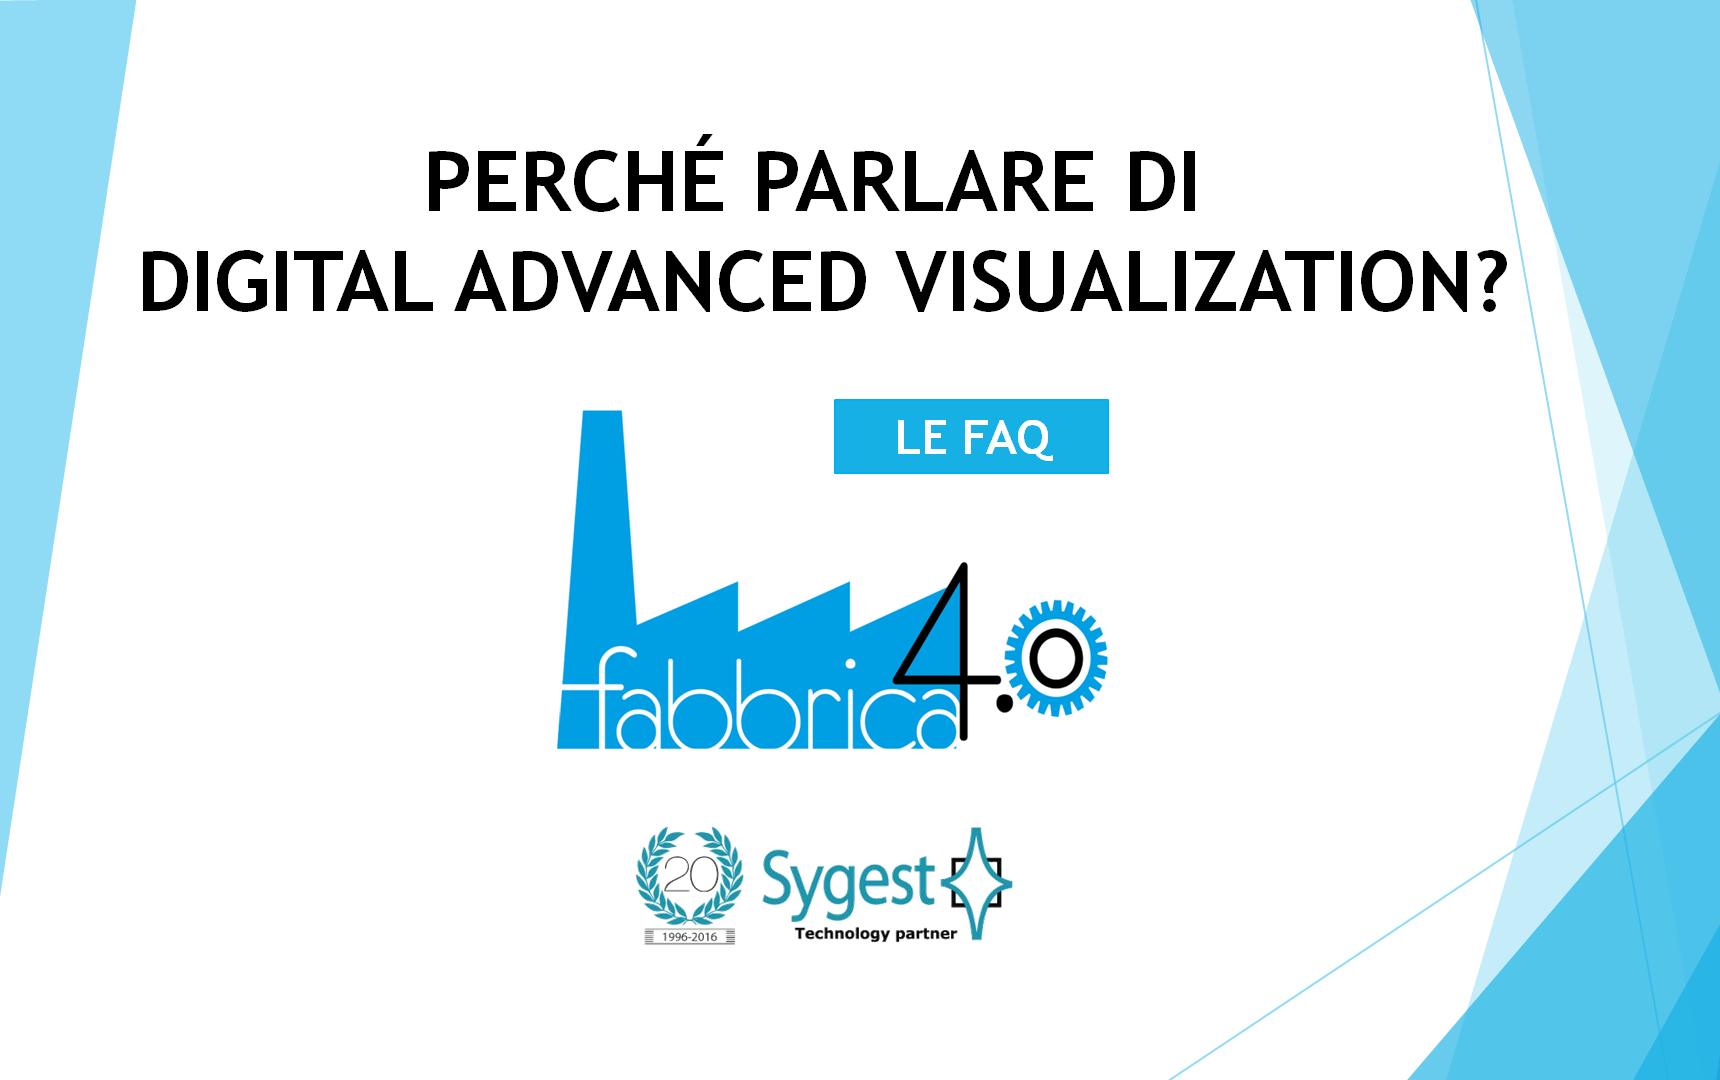 Digital Advanced Visualization - Fabbrica 4.0 | Sygest